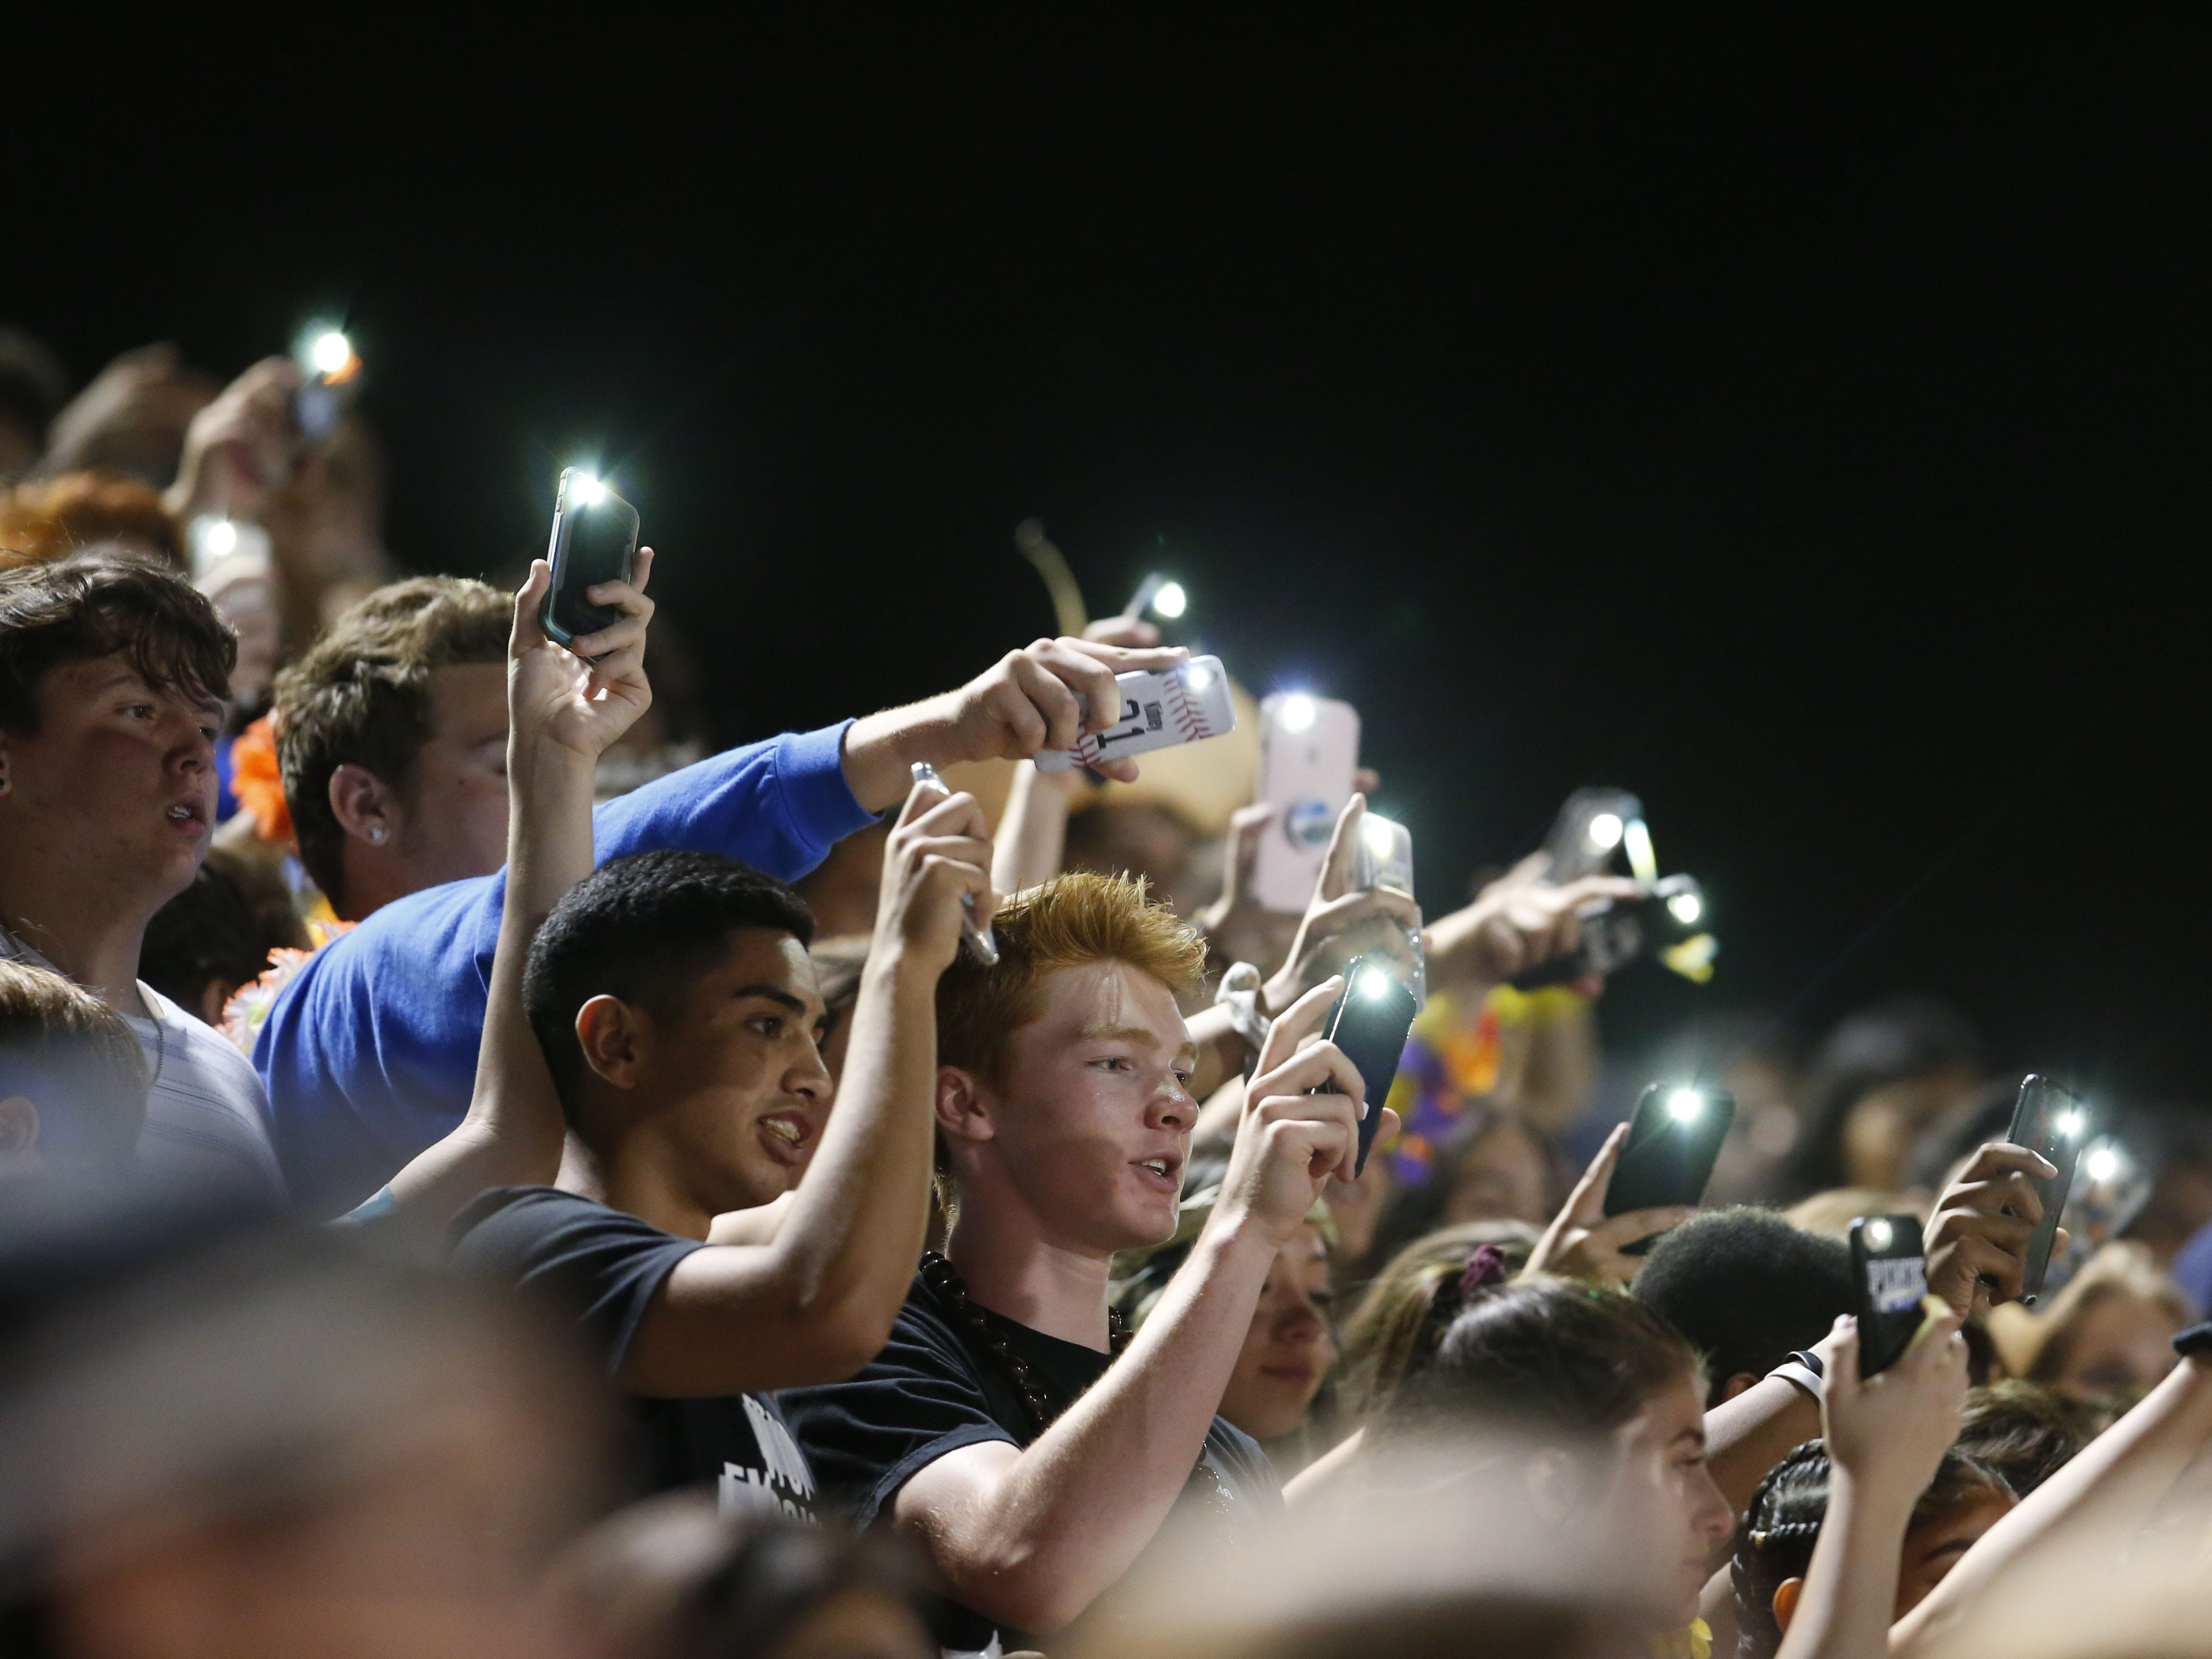 Chandler fans cheer after a touchdown during a high school football against Queen Creek at Chandler High on August 24, 2018. #azhsfb